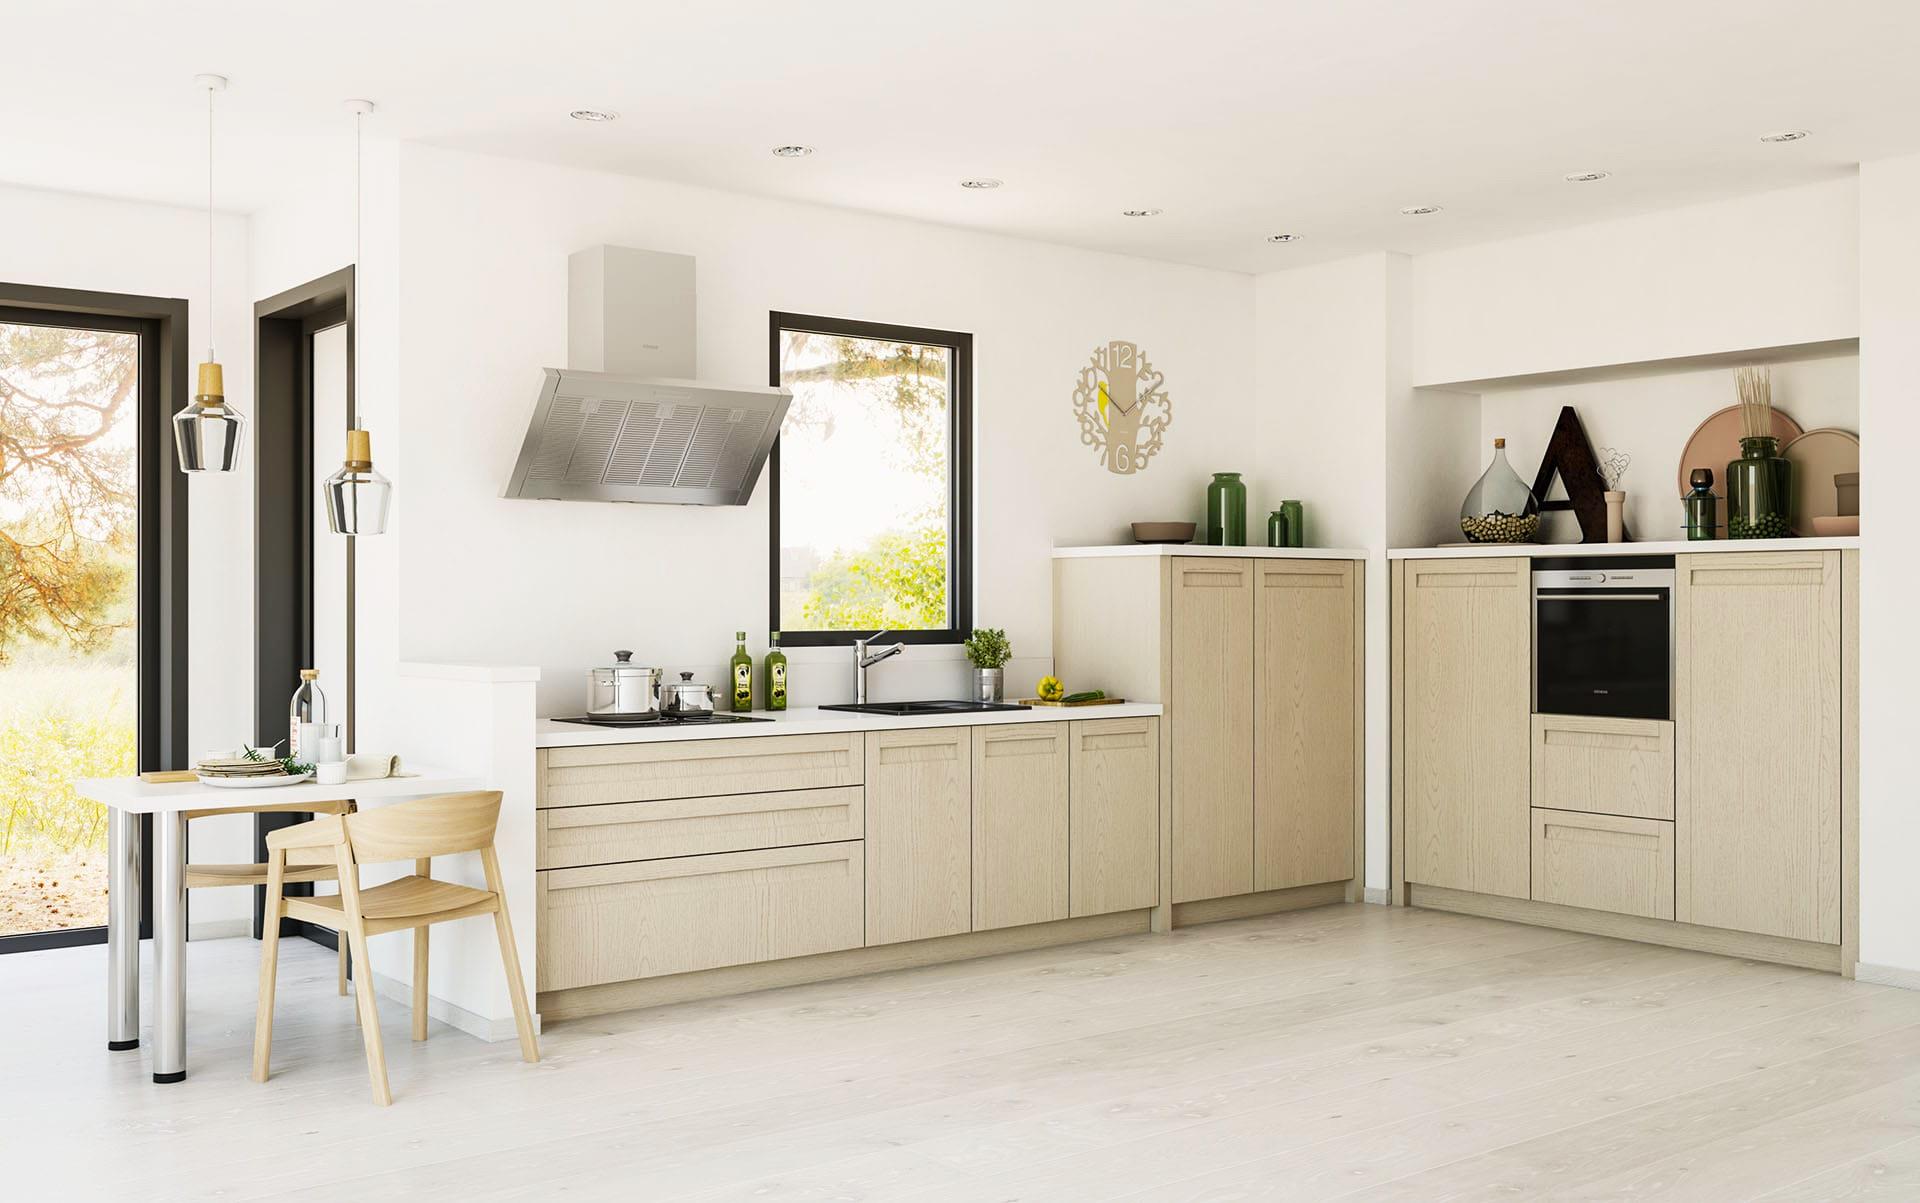 wohnküche helle küche küchenblock mit e geräten